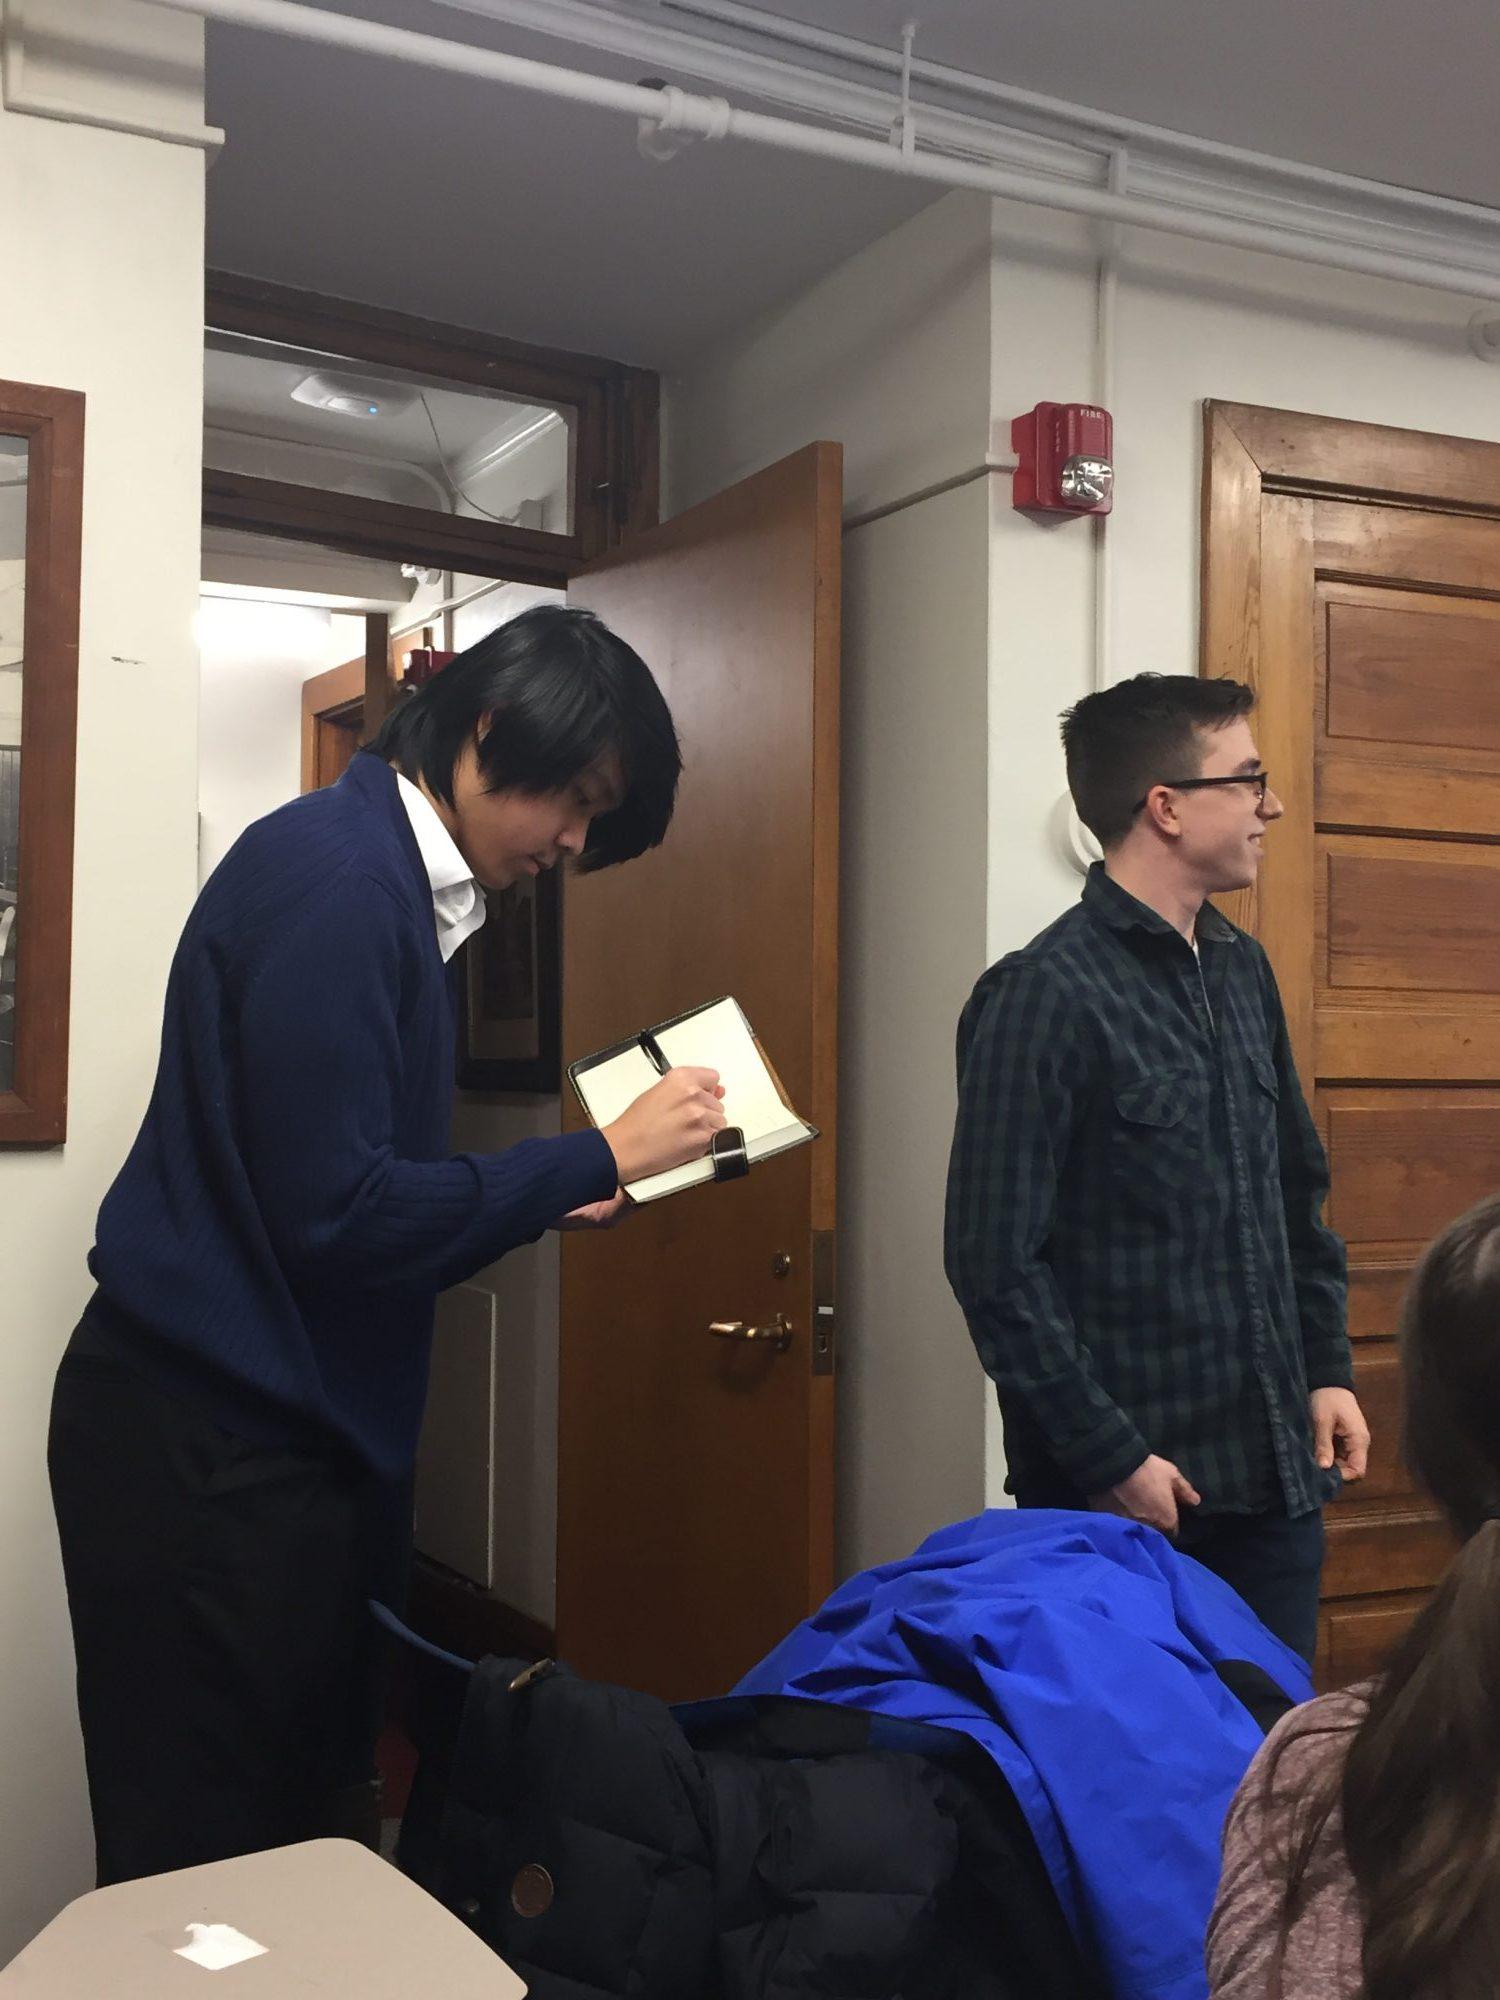 Jacob Kordeleski inducts Nam Vo into Eta Sigma Phi.